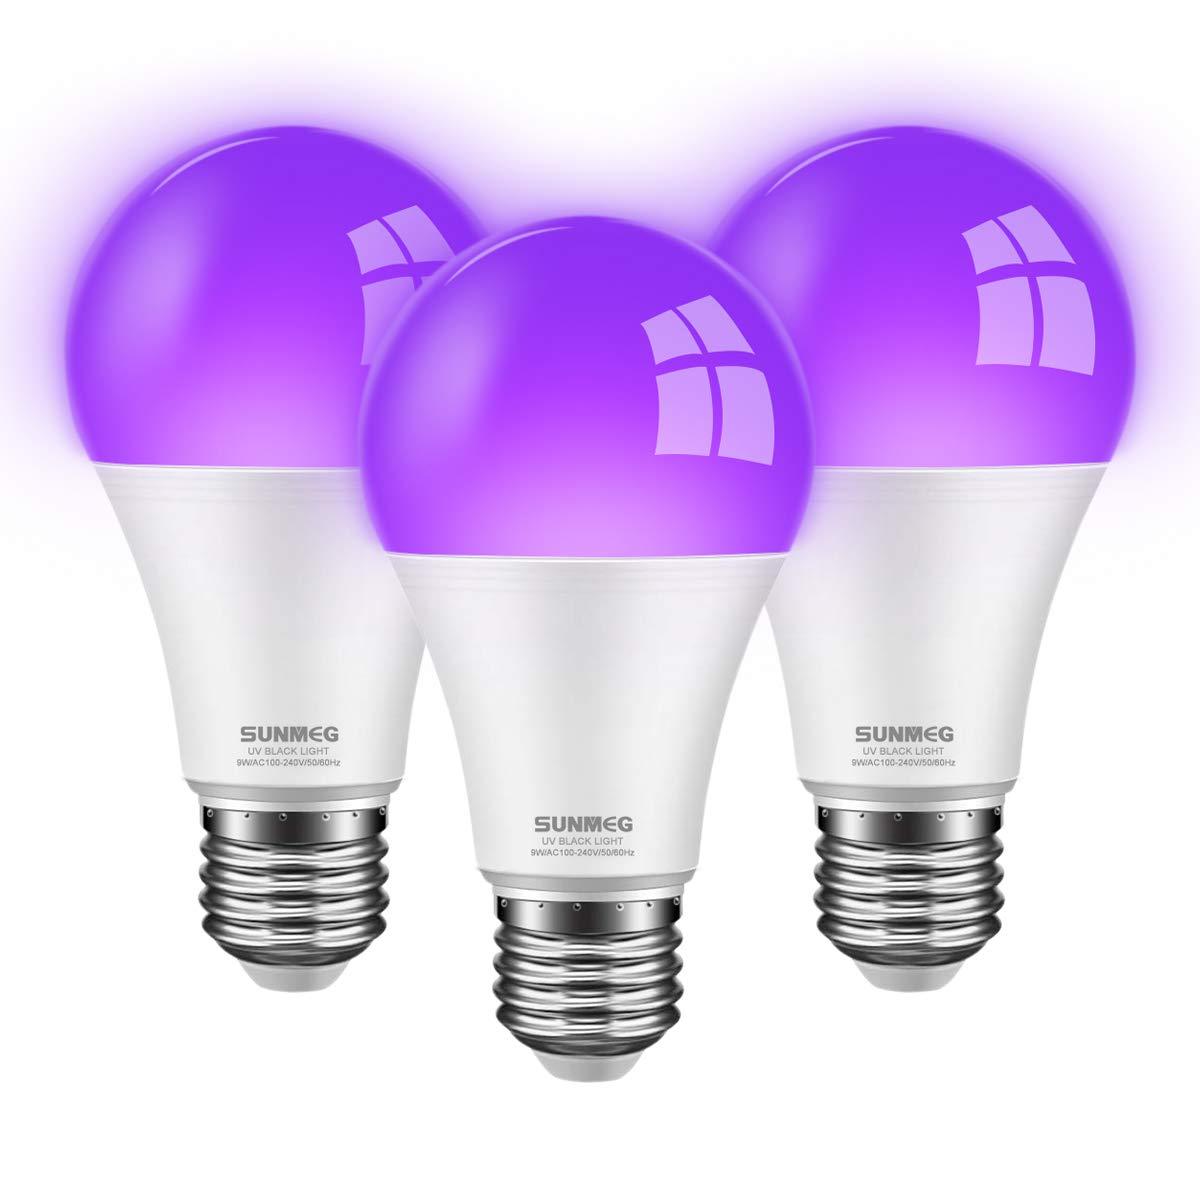 SUNMEG UV LED Black Light Bulbs 3 Pack 9W E26/E27 A19 Bulbs, UVA Level 395-400nm, Glow in The Dark for Black Light Party Birthday Wedding Halloween Body Paint, Fluorescent Poster, Neon Glow